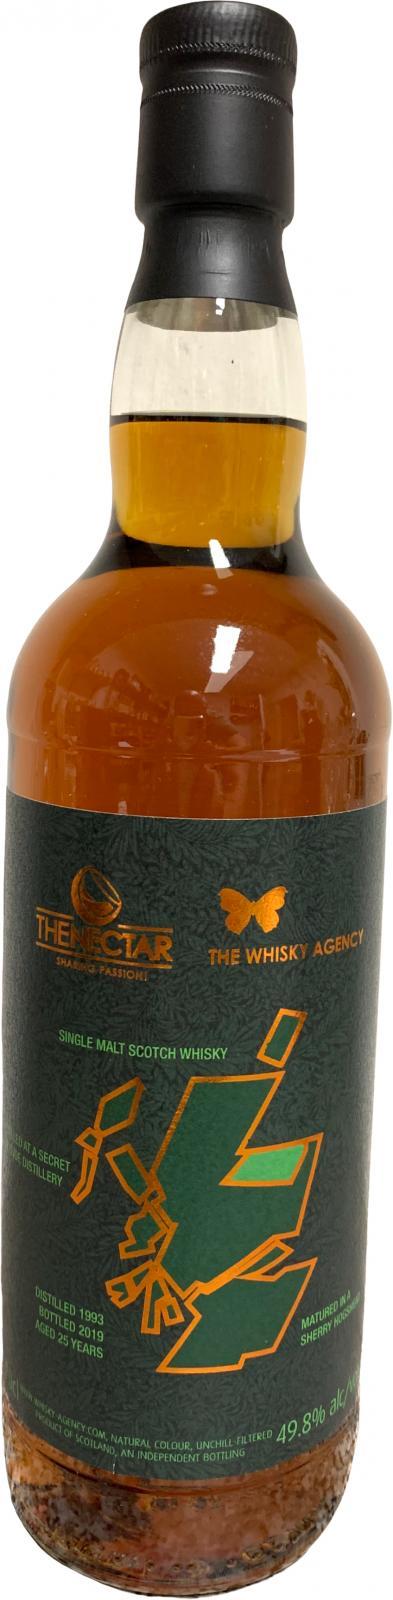 Secret Speyside Distillery 1993 TWA